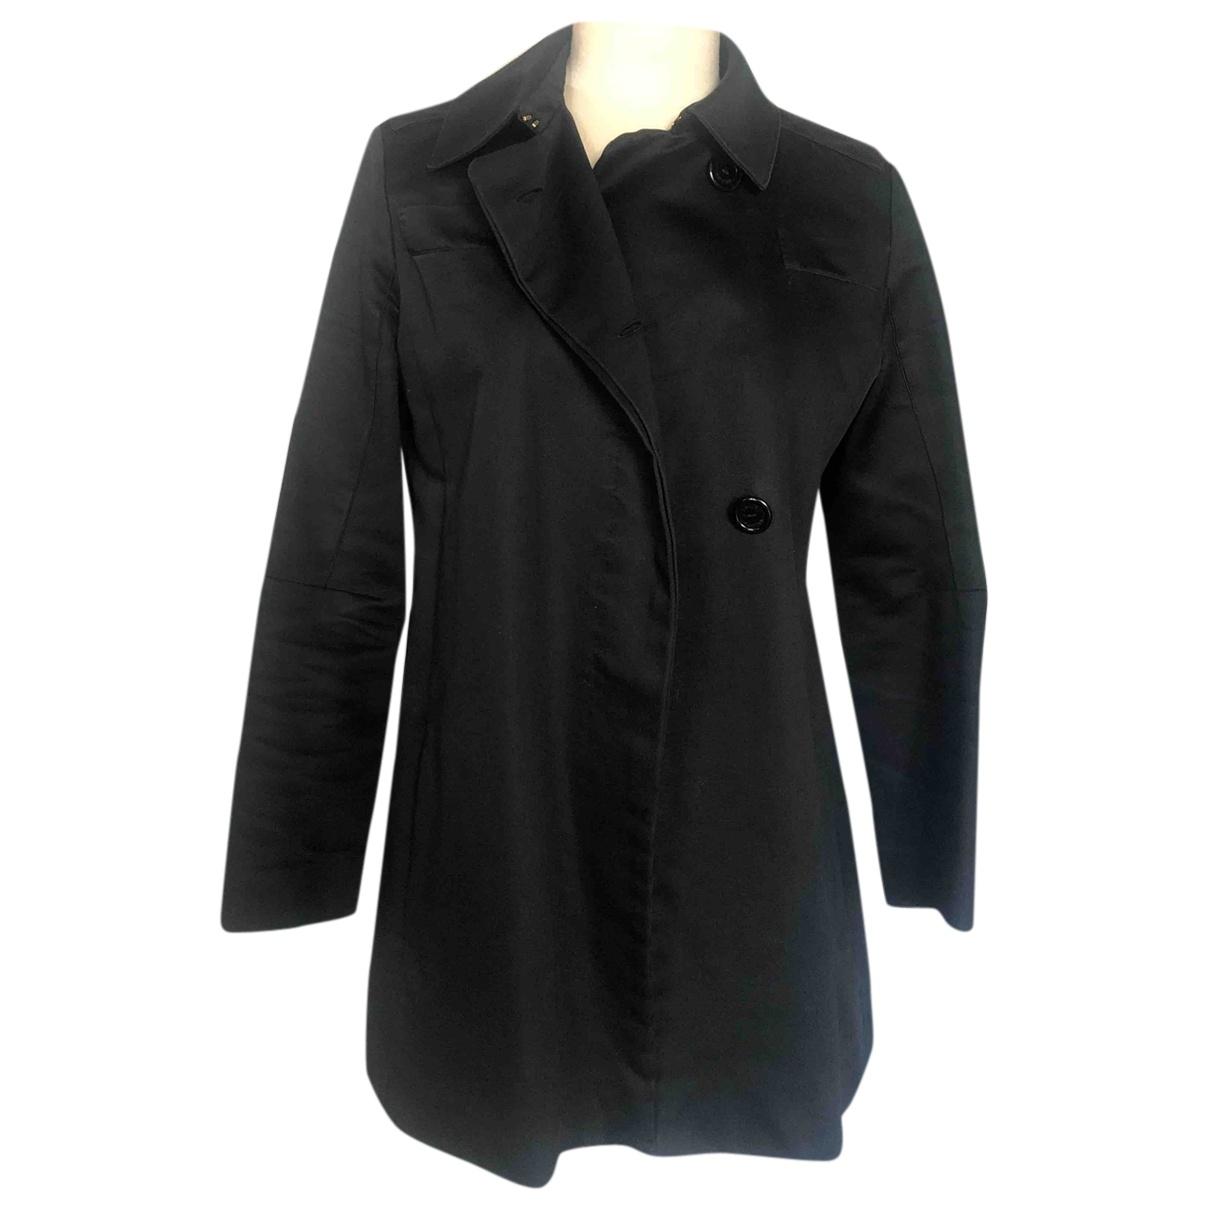 Louis Vuitton \N Black Cotton jacket for Women 38 FR